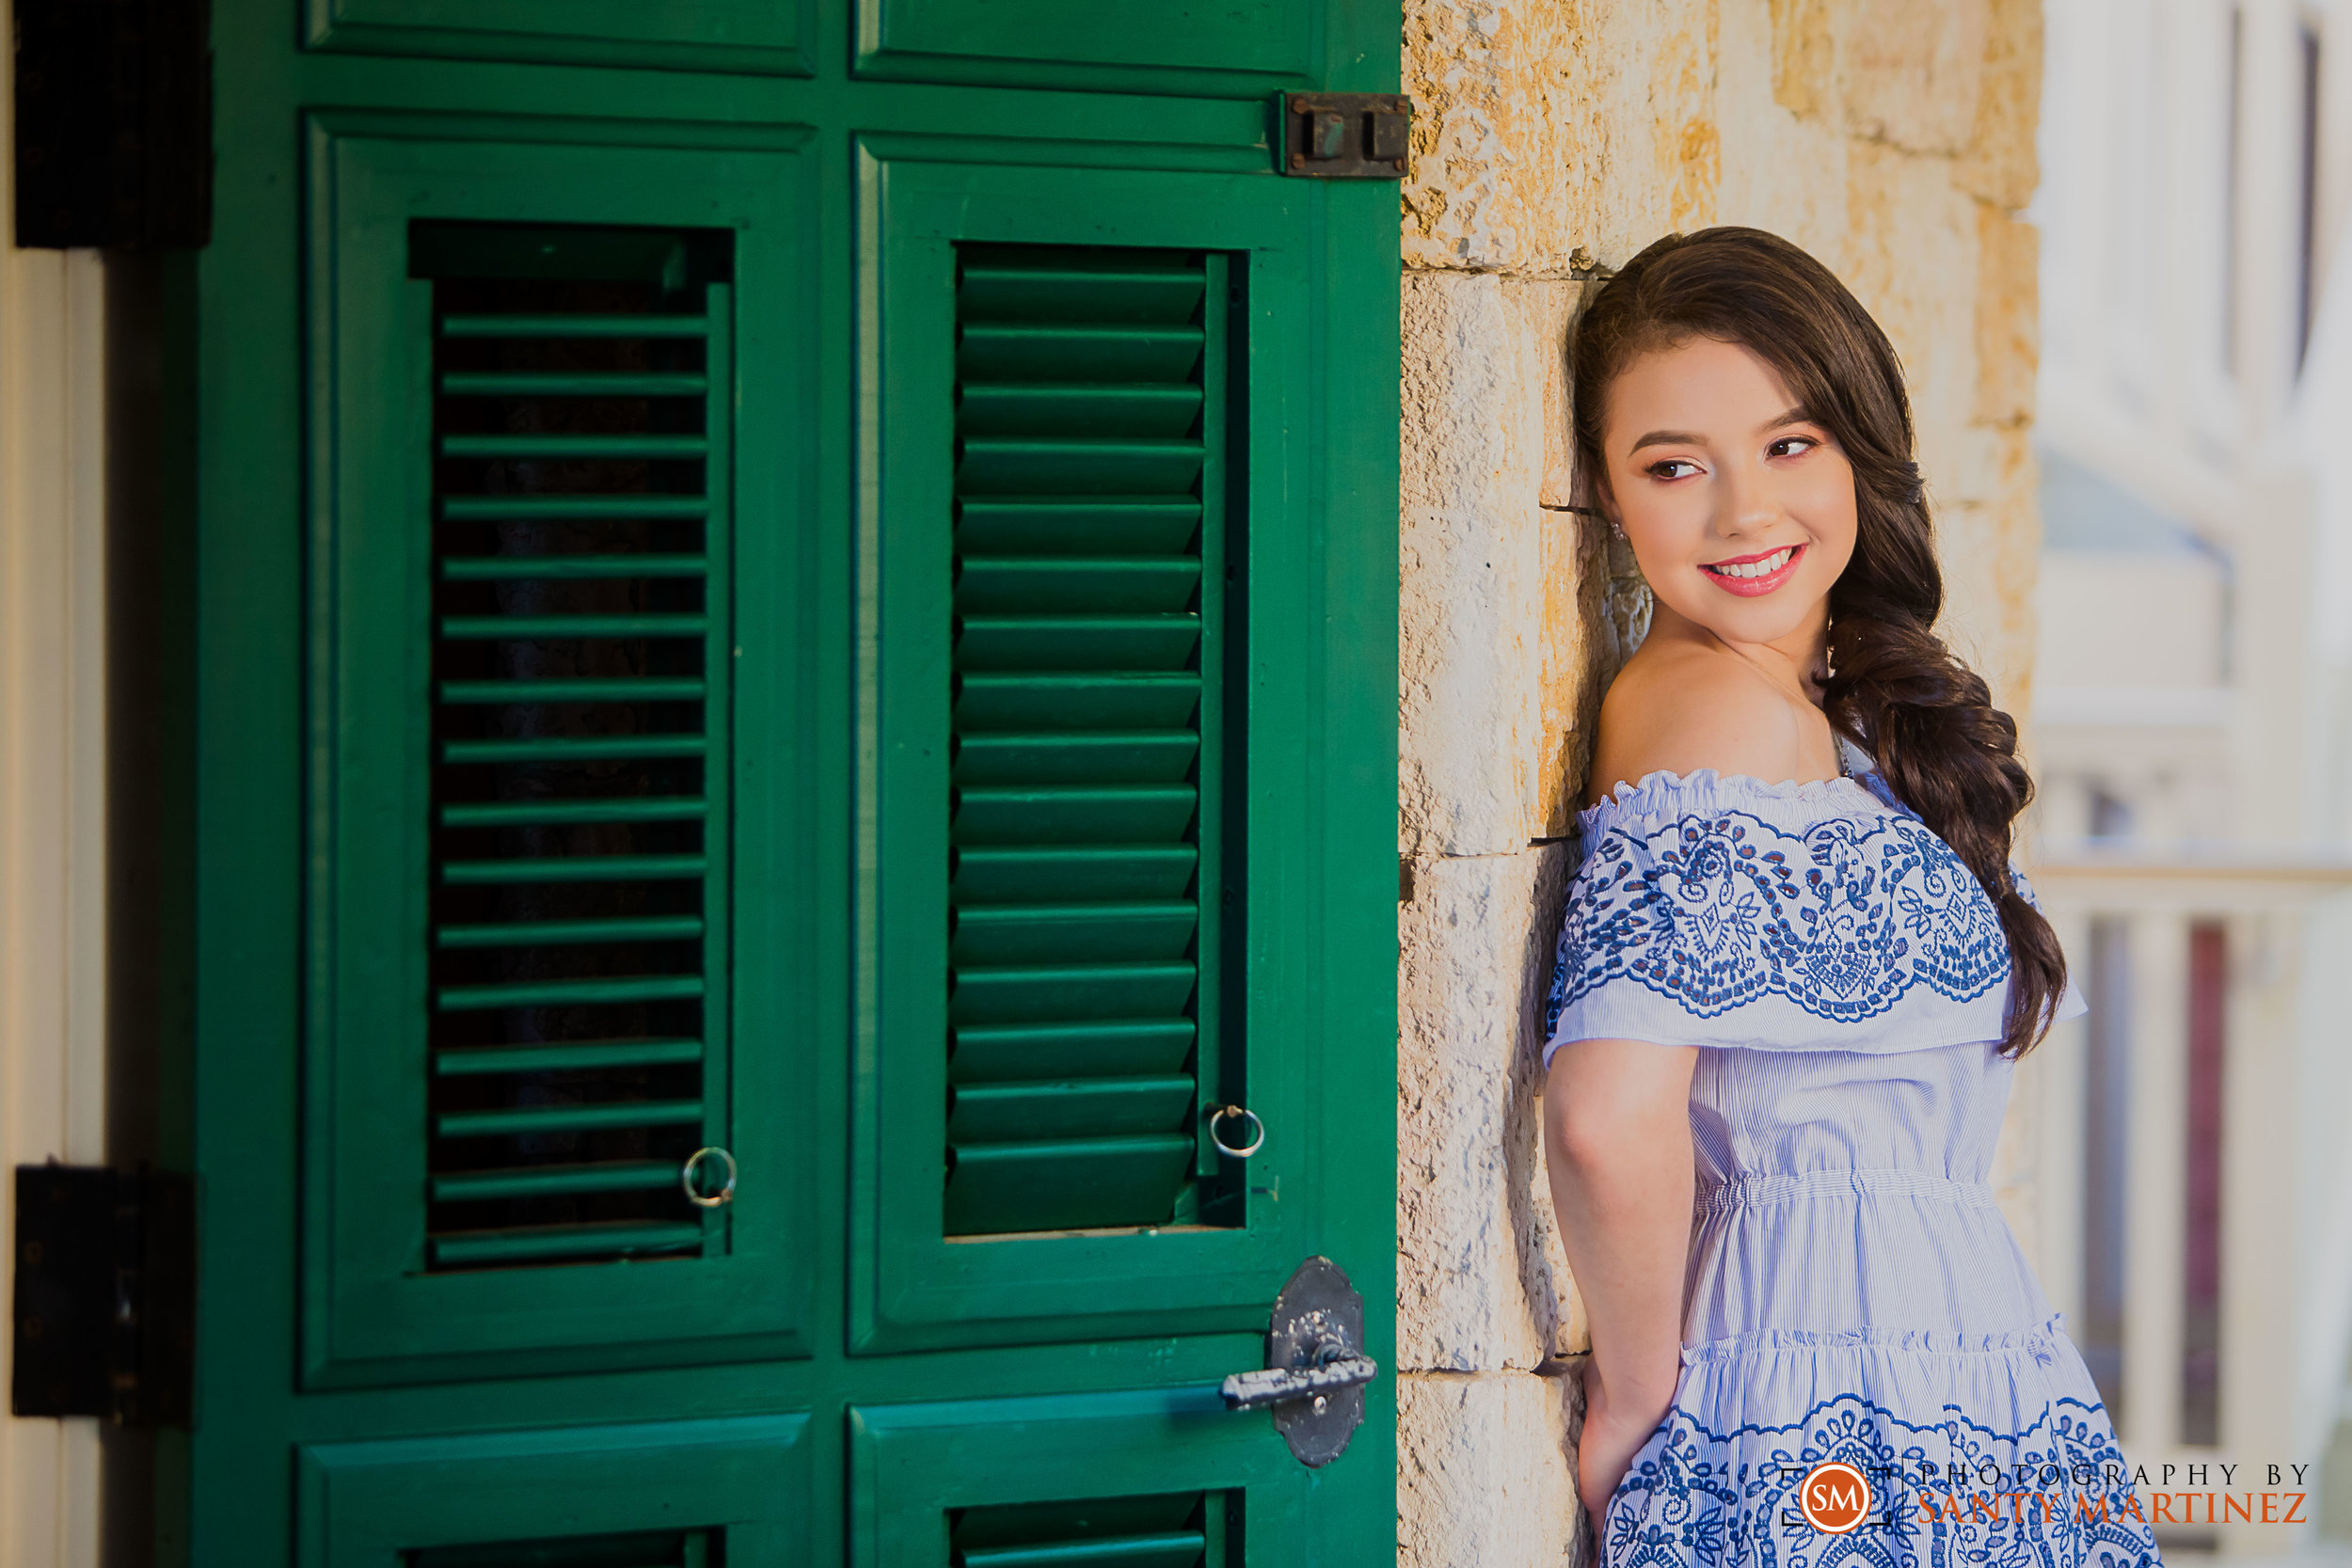 Quinces - Miami - Deering Estate - Santy Martinez Photography-16.jpg